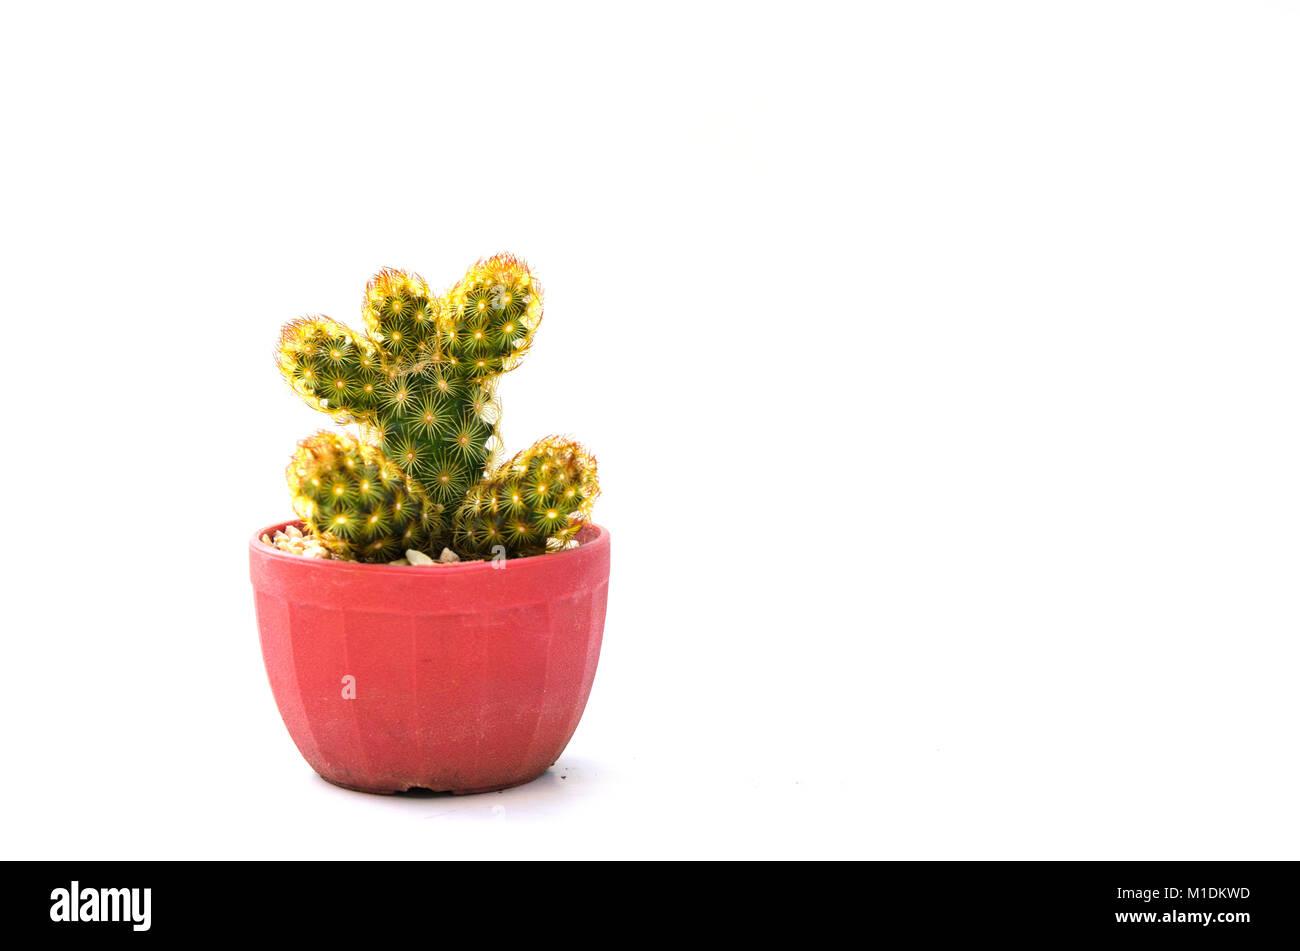 Poisonous Cactus Stock Photos & Poisonous Cactus Stock Images - Alamy